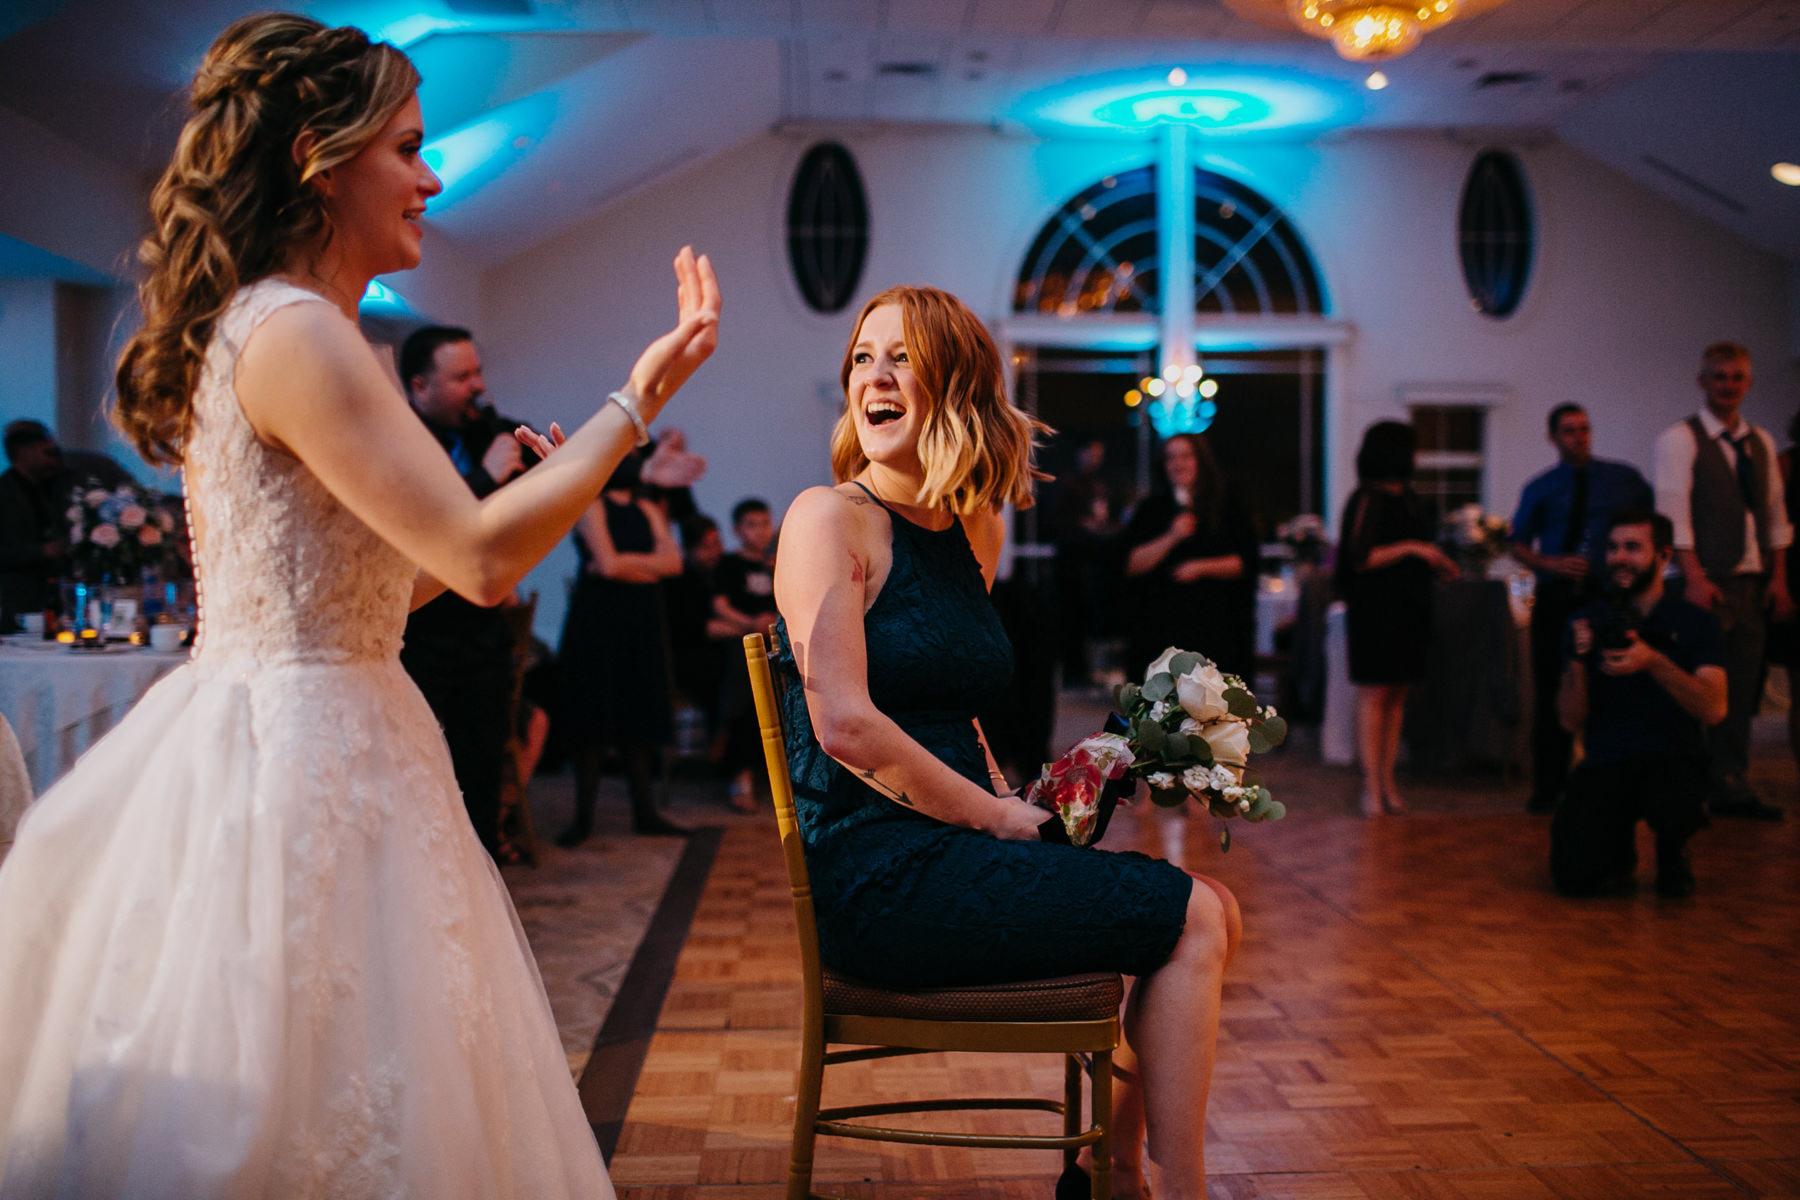 Quincy Ma Massachusetts Wedding Dedham Boston Granie Links Wedding New England Catholic Cathedral Liz Osban Photography 132.jpg